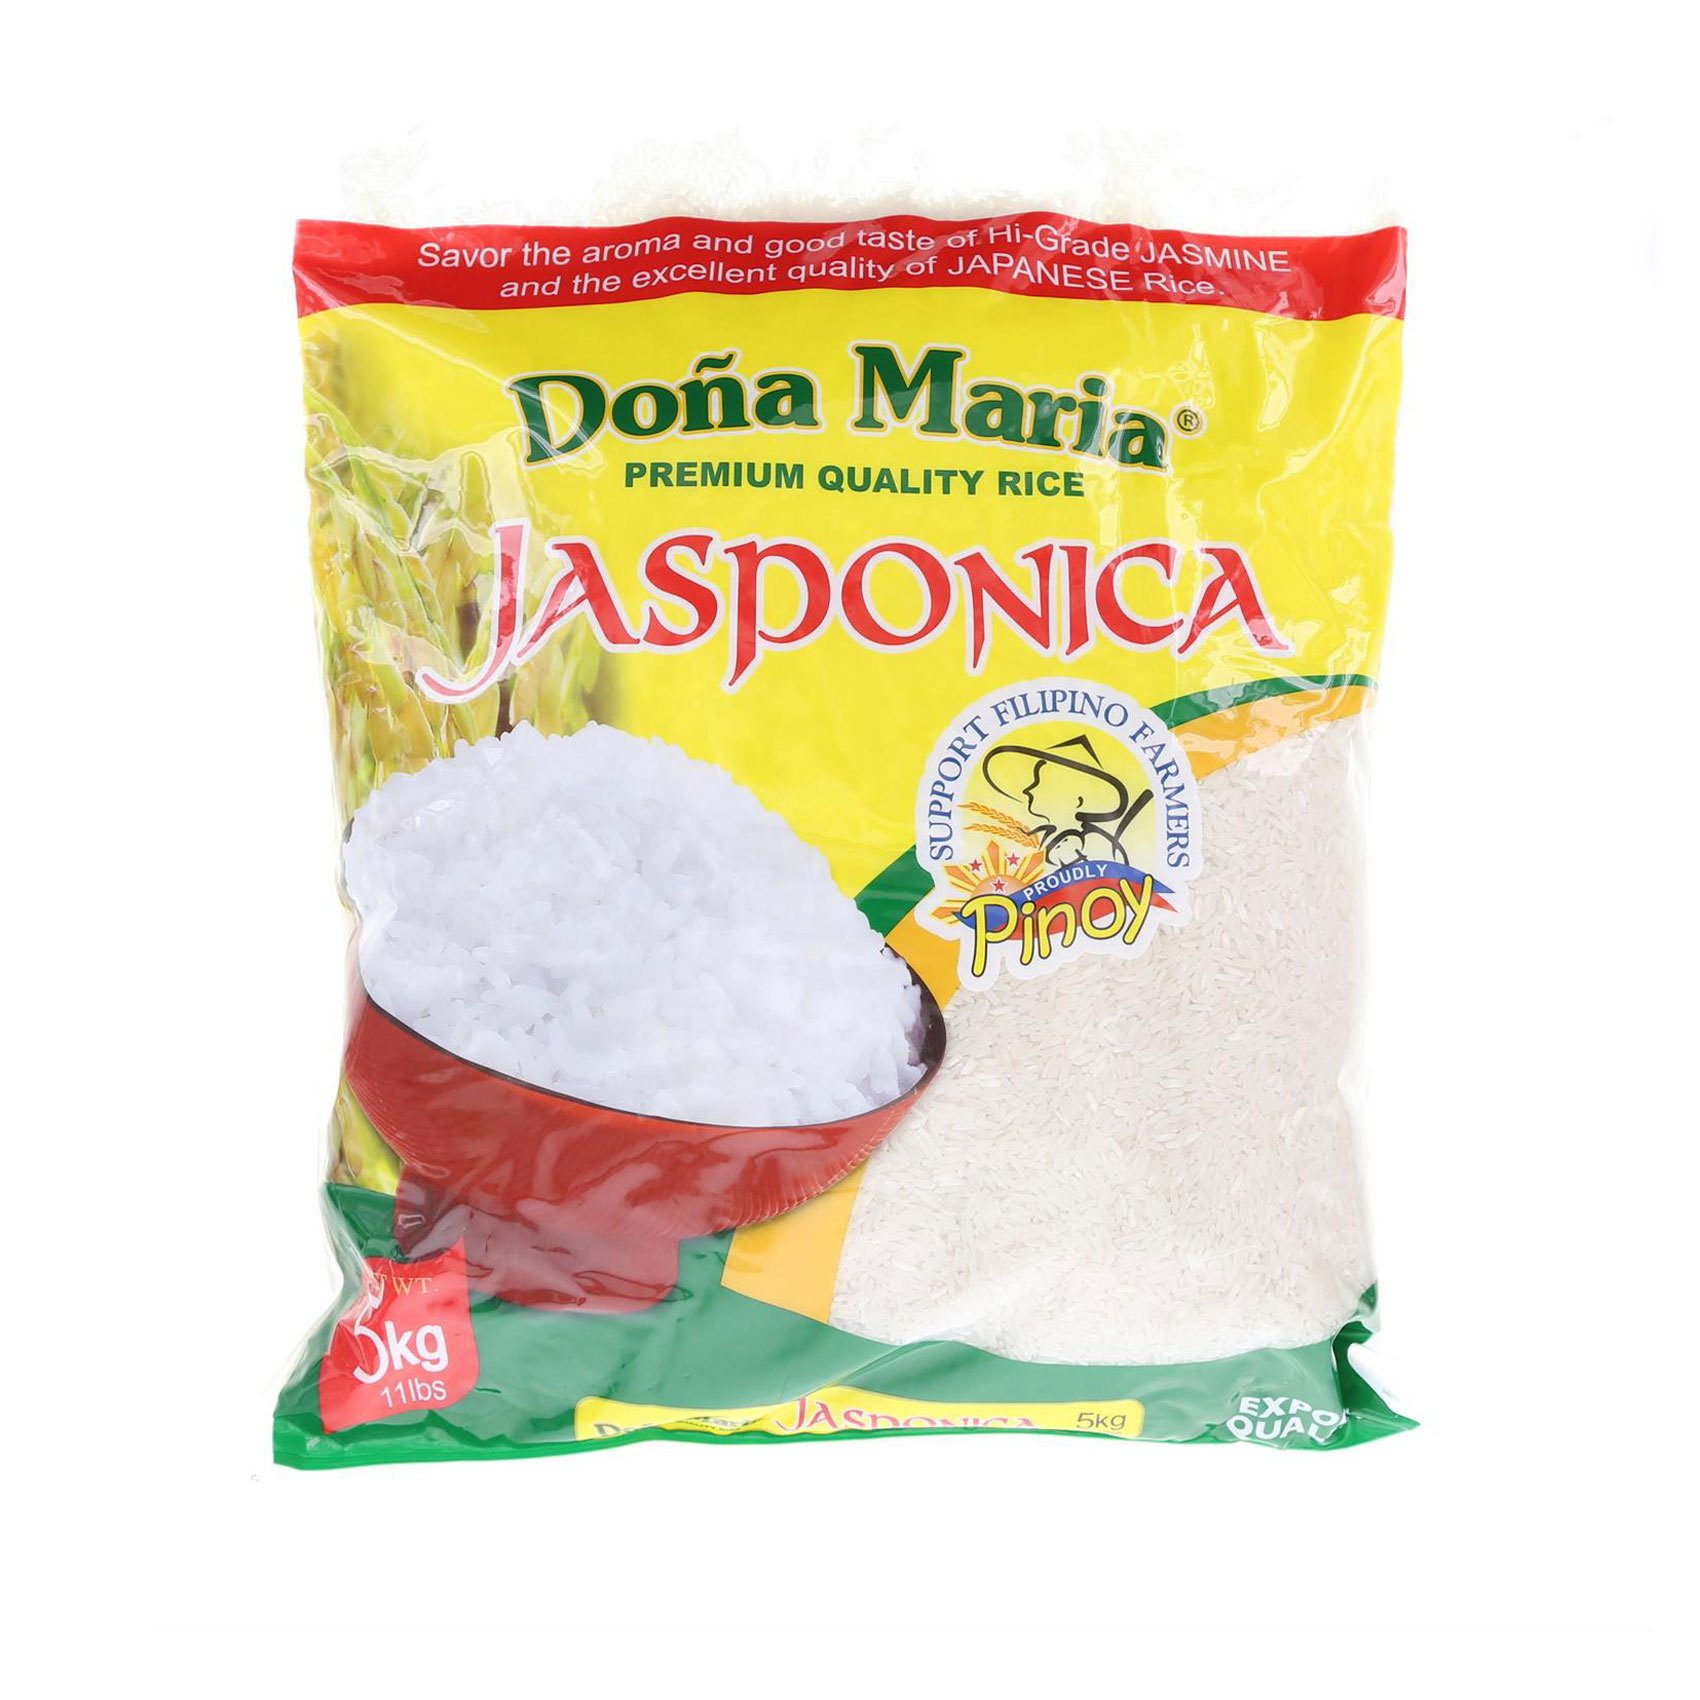 DONA MARIA JASPONICA RICE 5KG